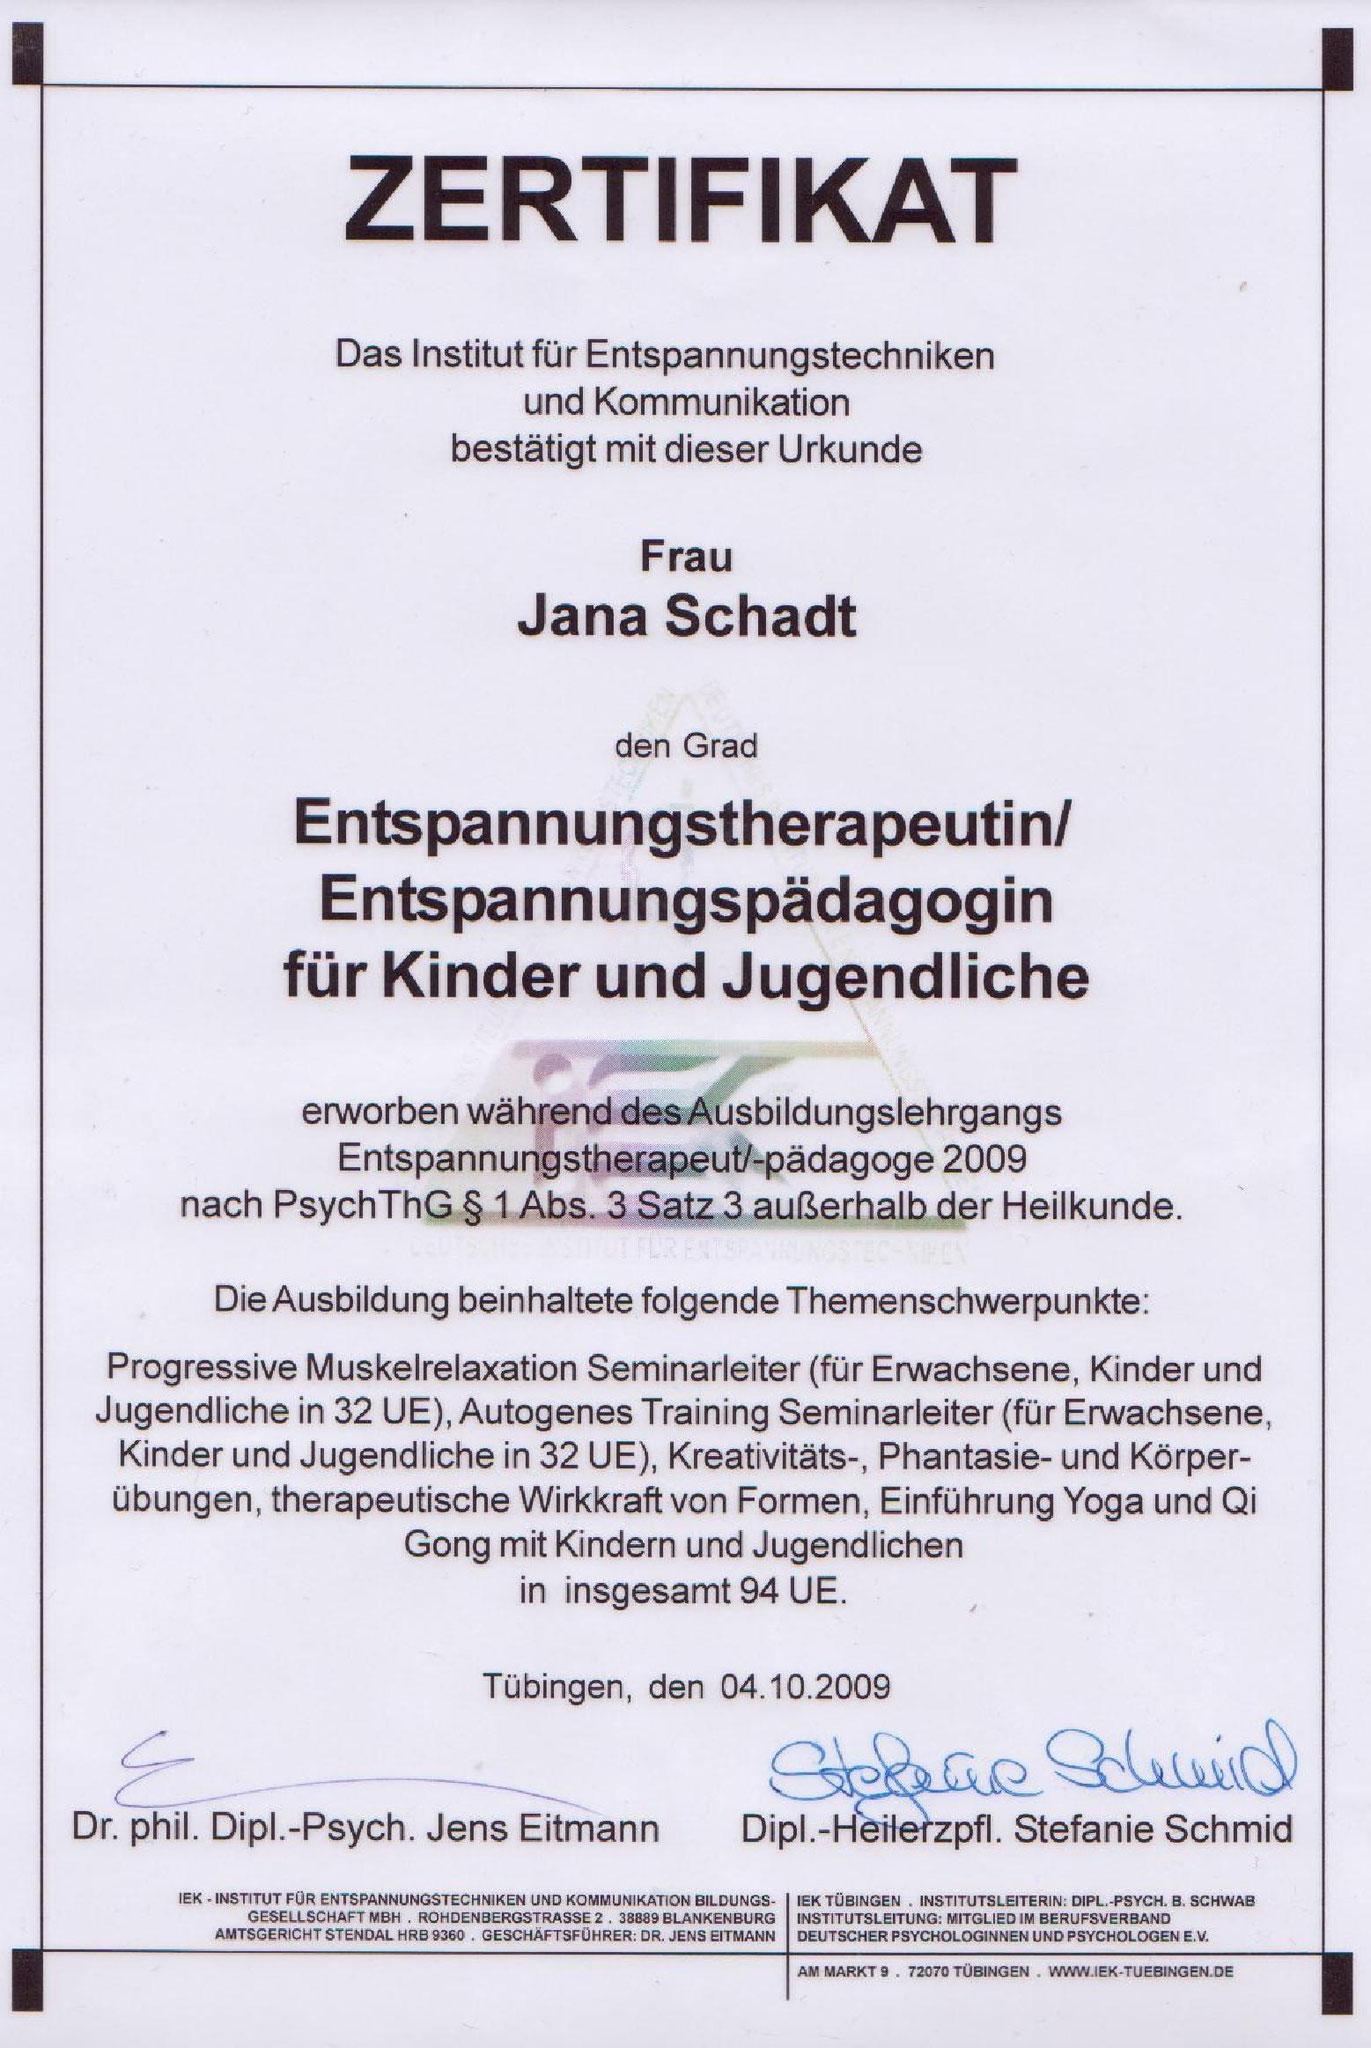 Jana Schadt Entspannungstherapeutin